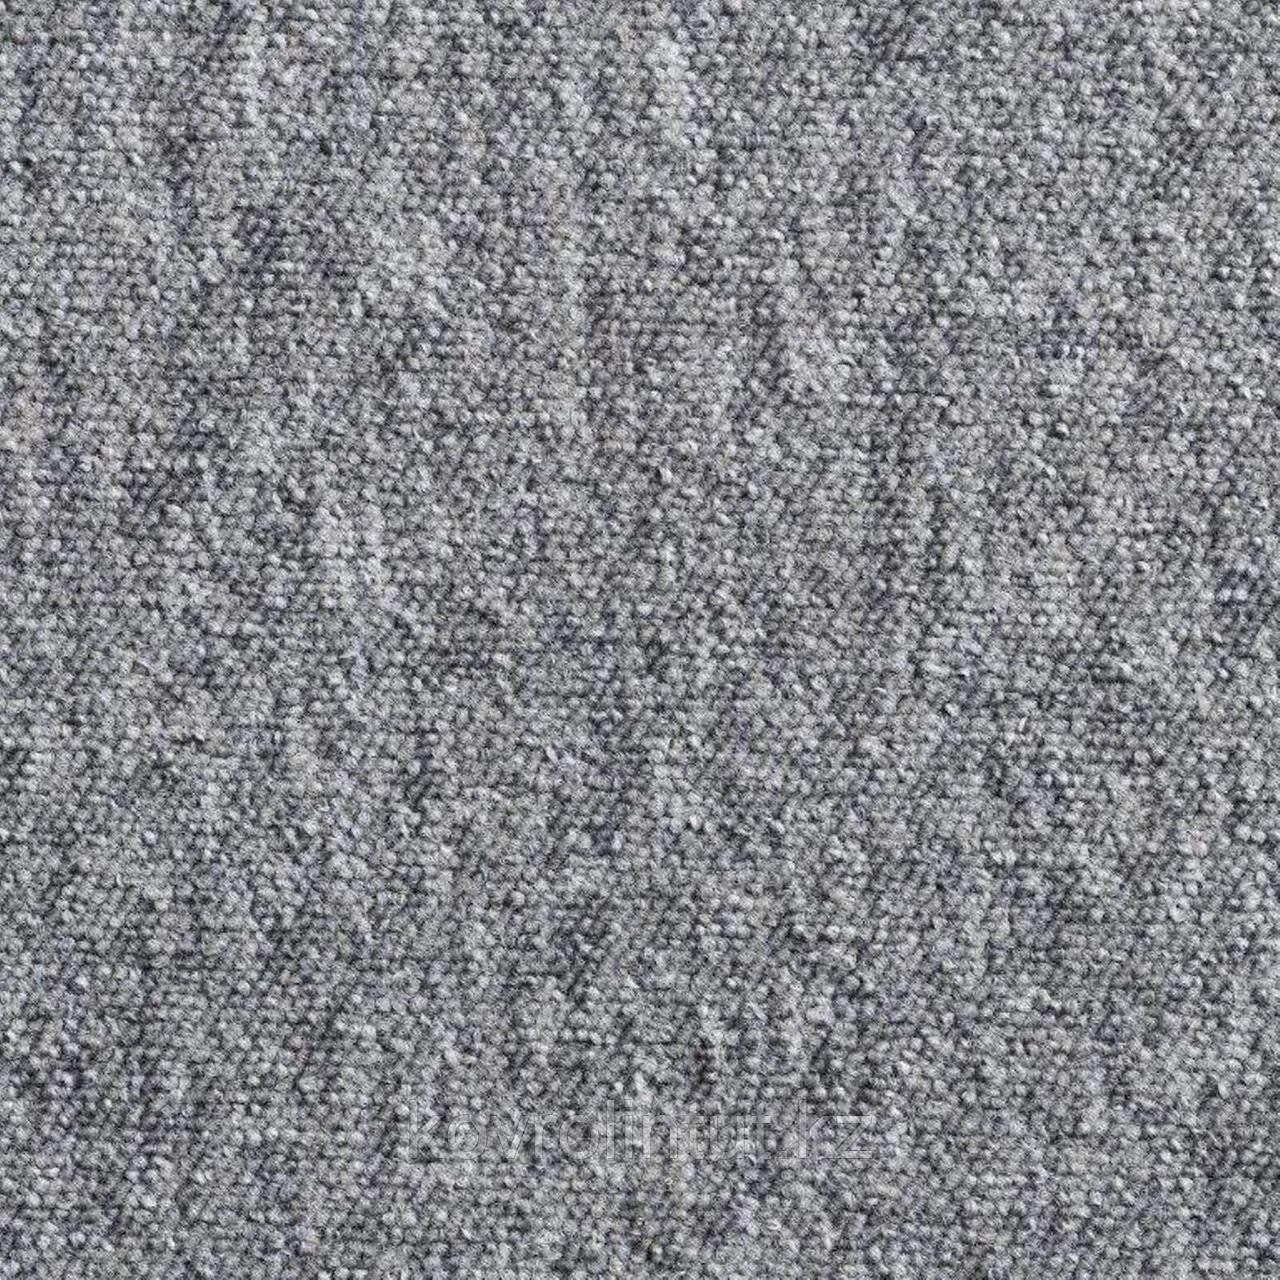 Плитка ковровая Сondor, Solid 75, 50х50, 5м2/уп